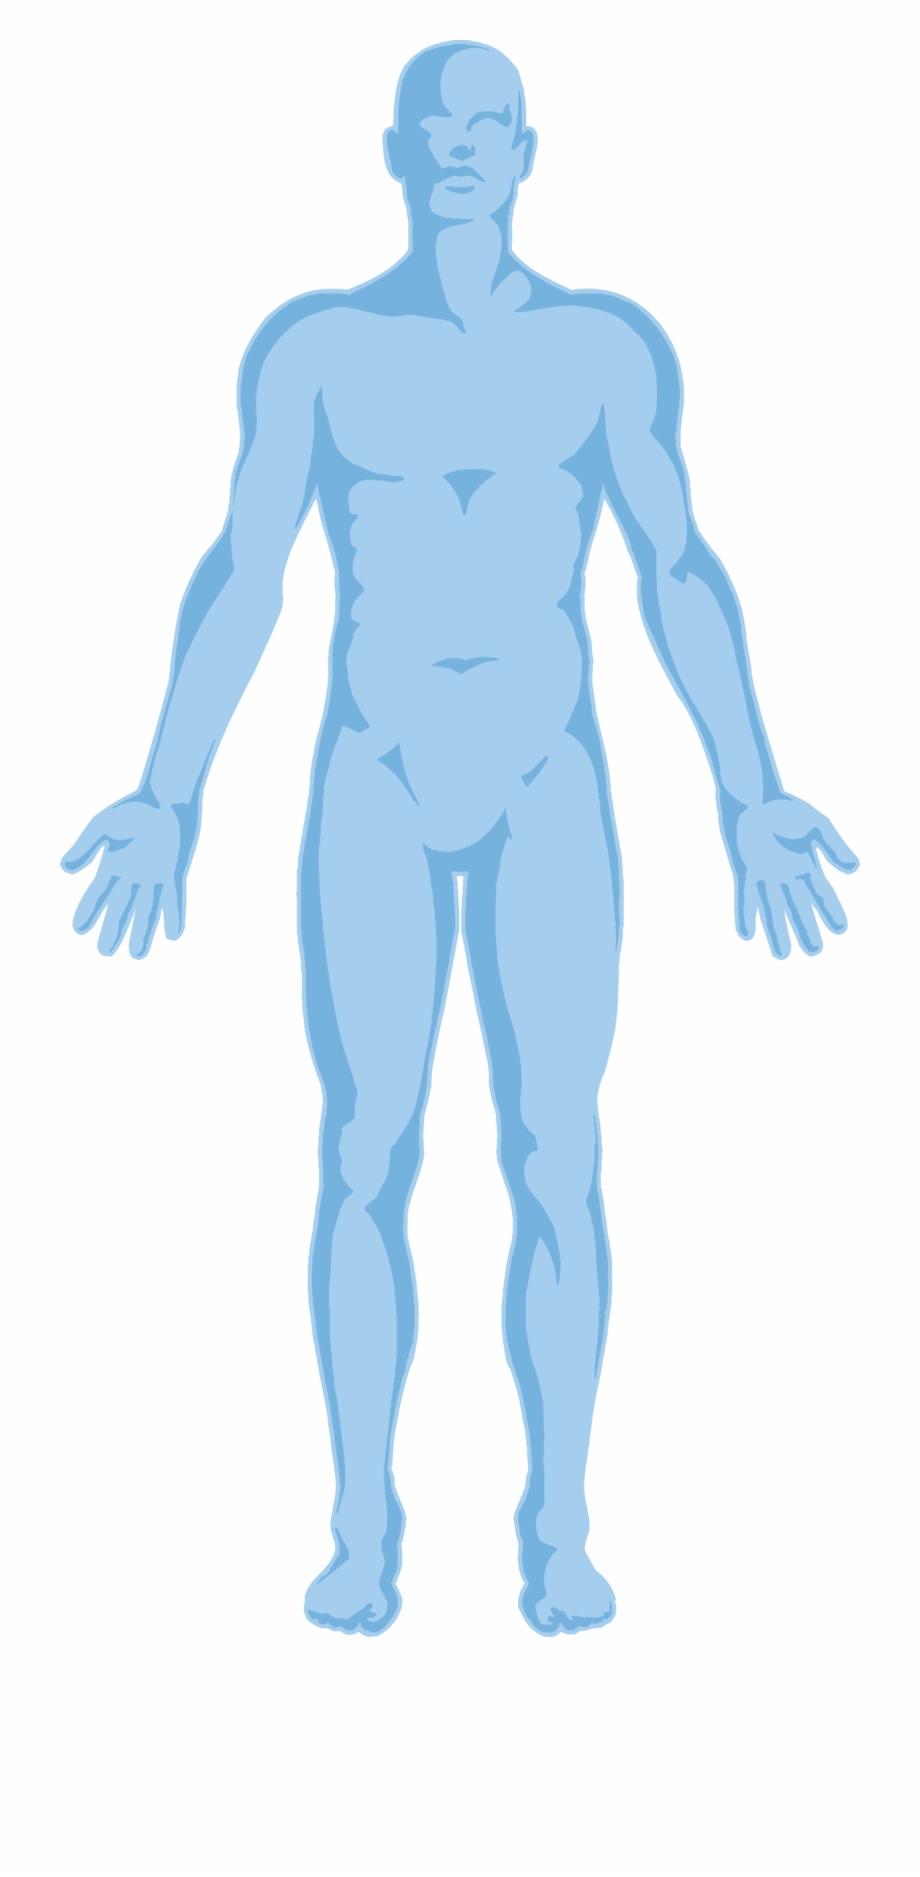 Body body outline.